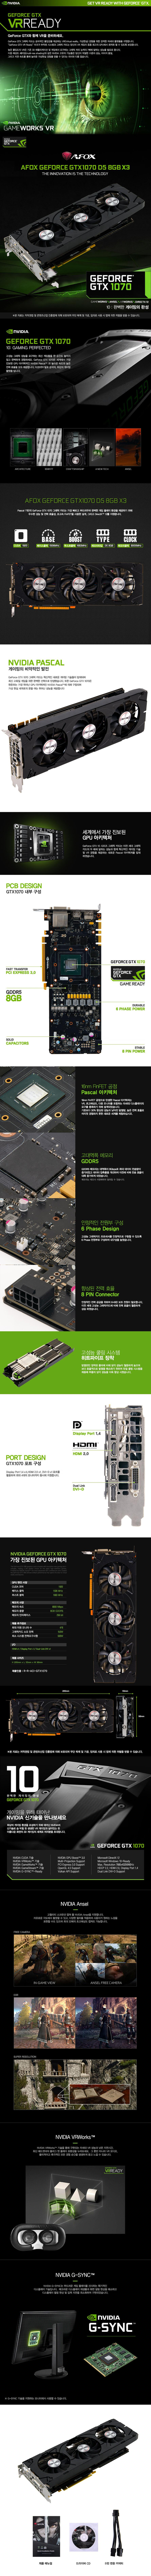 AFOX-지포스-GTX-1070-D5-8GB-벌크.jpg